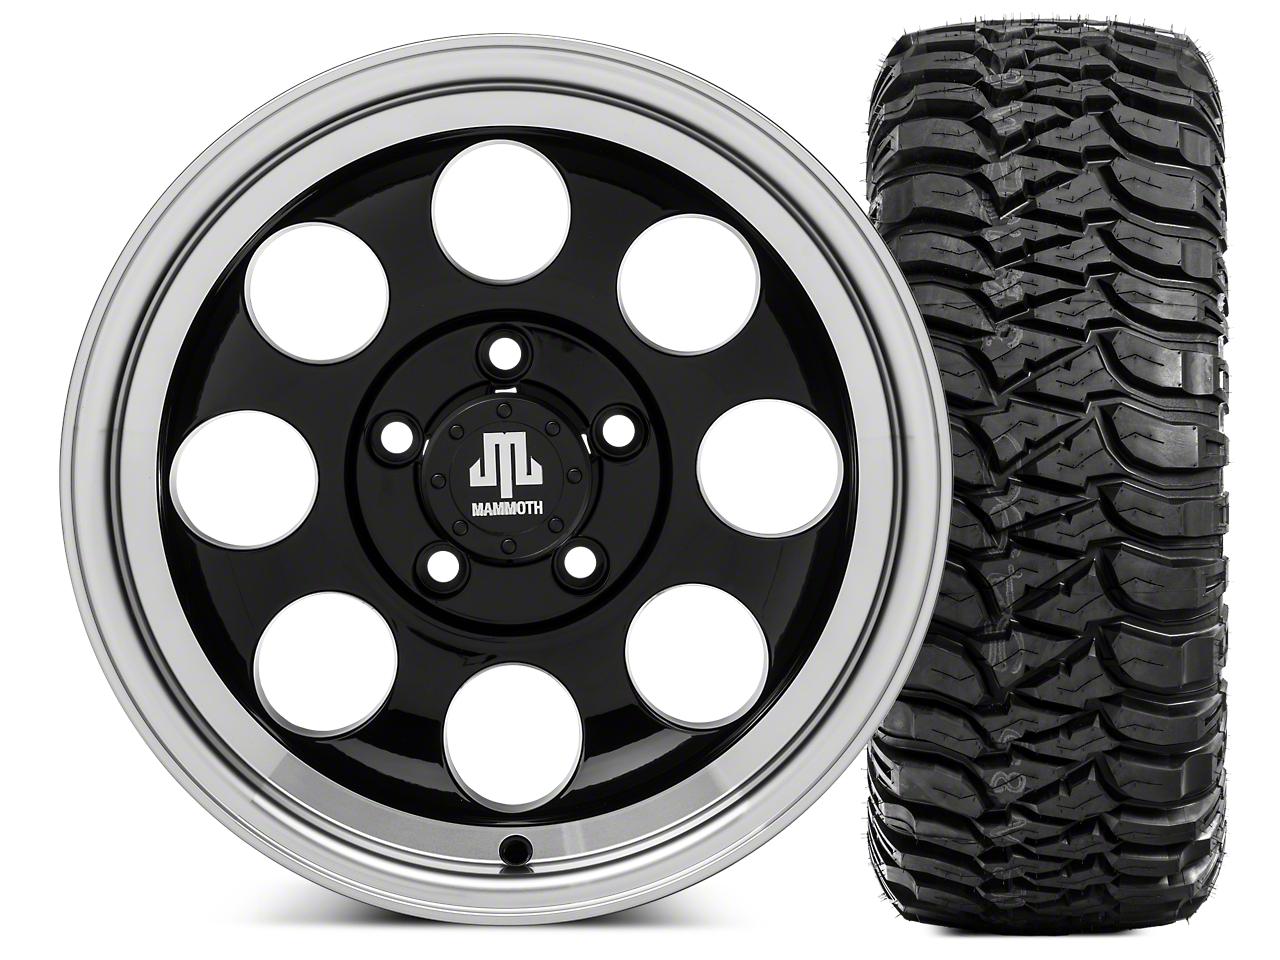 Mammoth 8 15x8 Wheel & Mickey Thompson Baja MTZ 33X12.50R15 Tire Kit (87-06 Jeep Wrangler YJ & TJ)